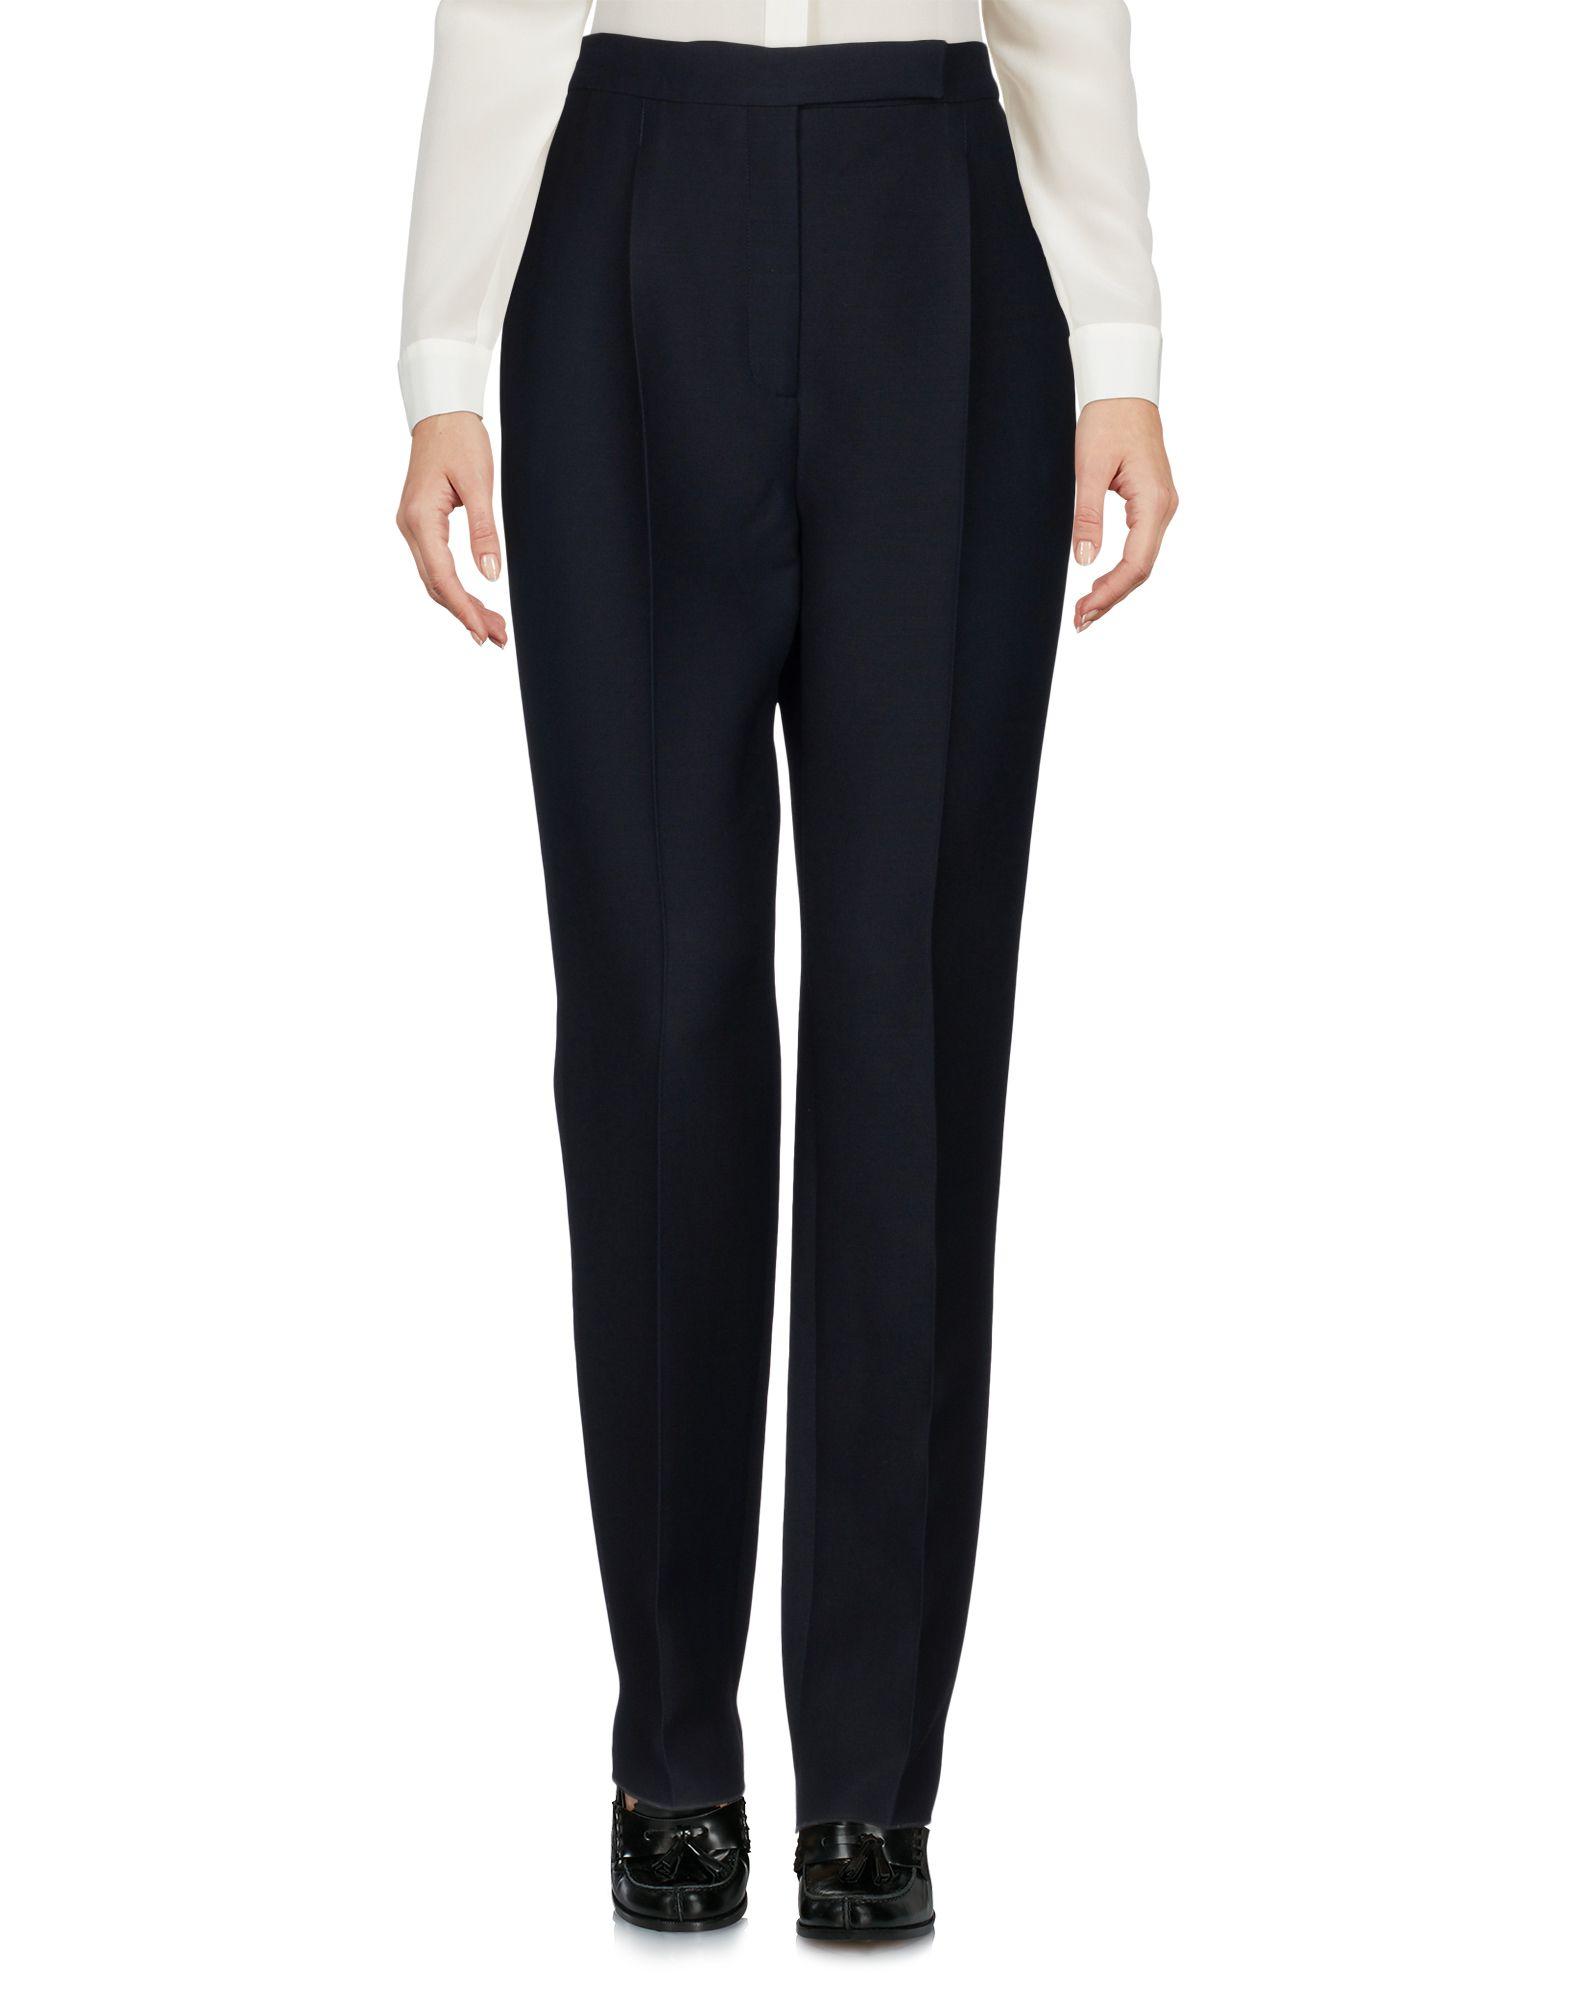 Pantalone Valentino damen - 36542760DV